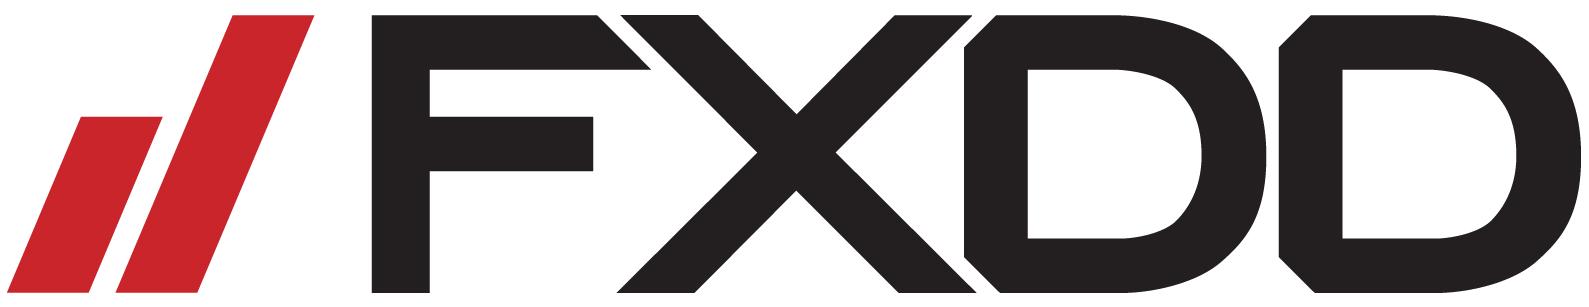 FXDD شركة